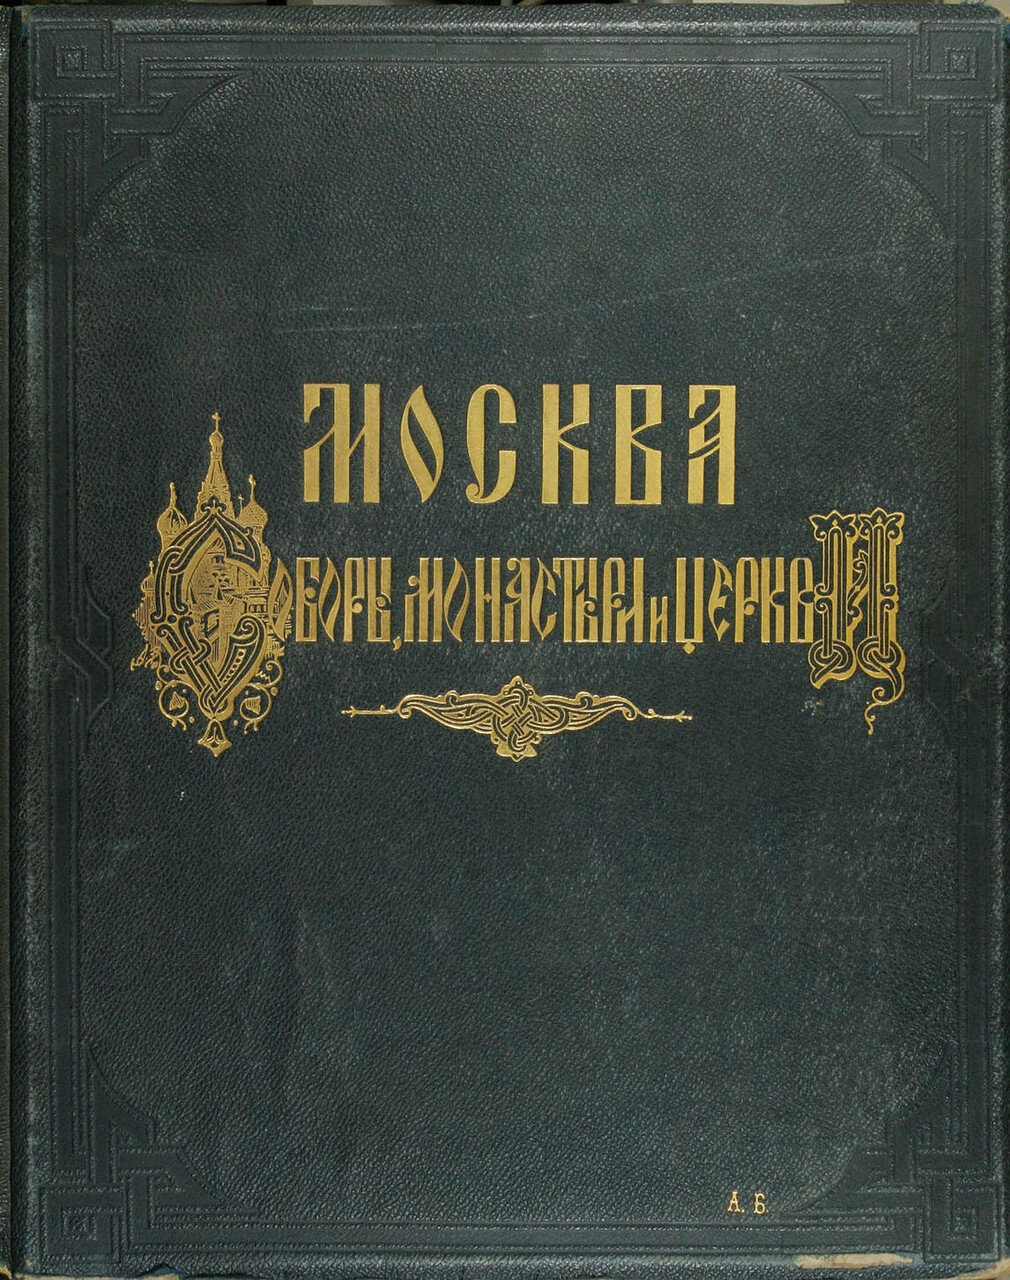 https://img-fotki.yandex.ru/get/49649/199368979.9/0_1a6150_c55c5a11_XXXL.jpg